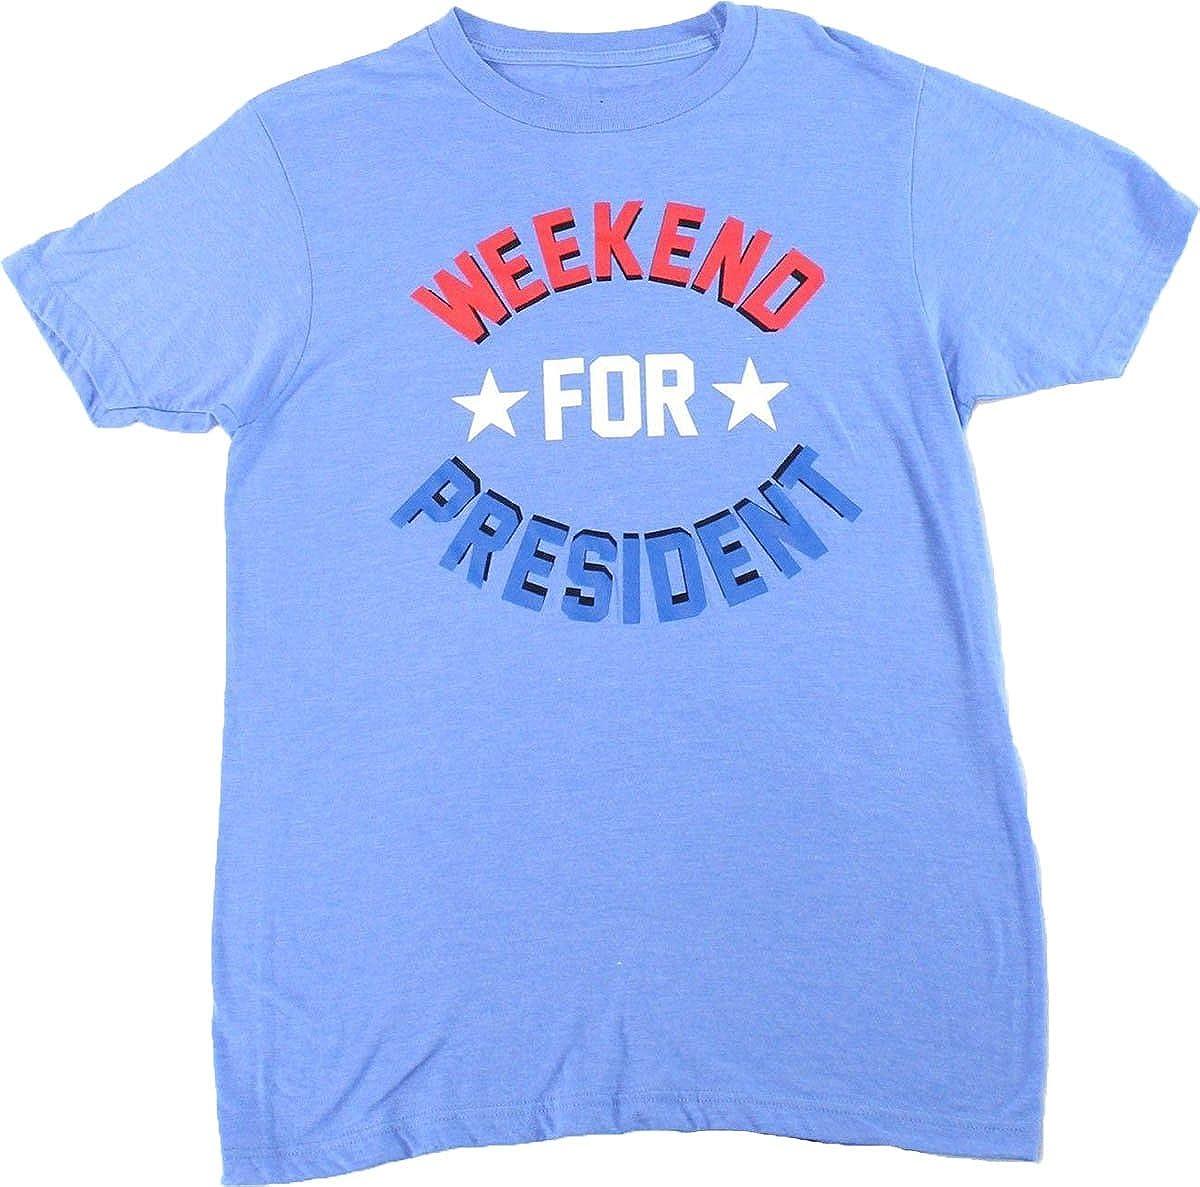 Jem Mens Weekend President Graphic T-Shirt Blue